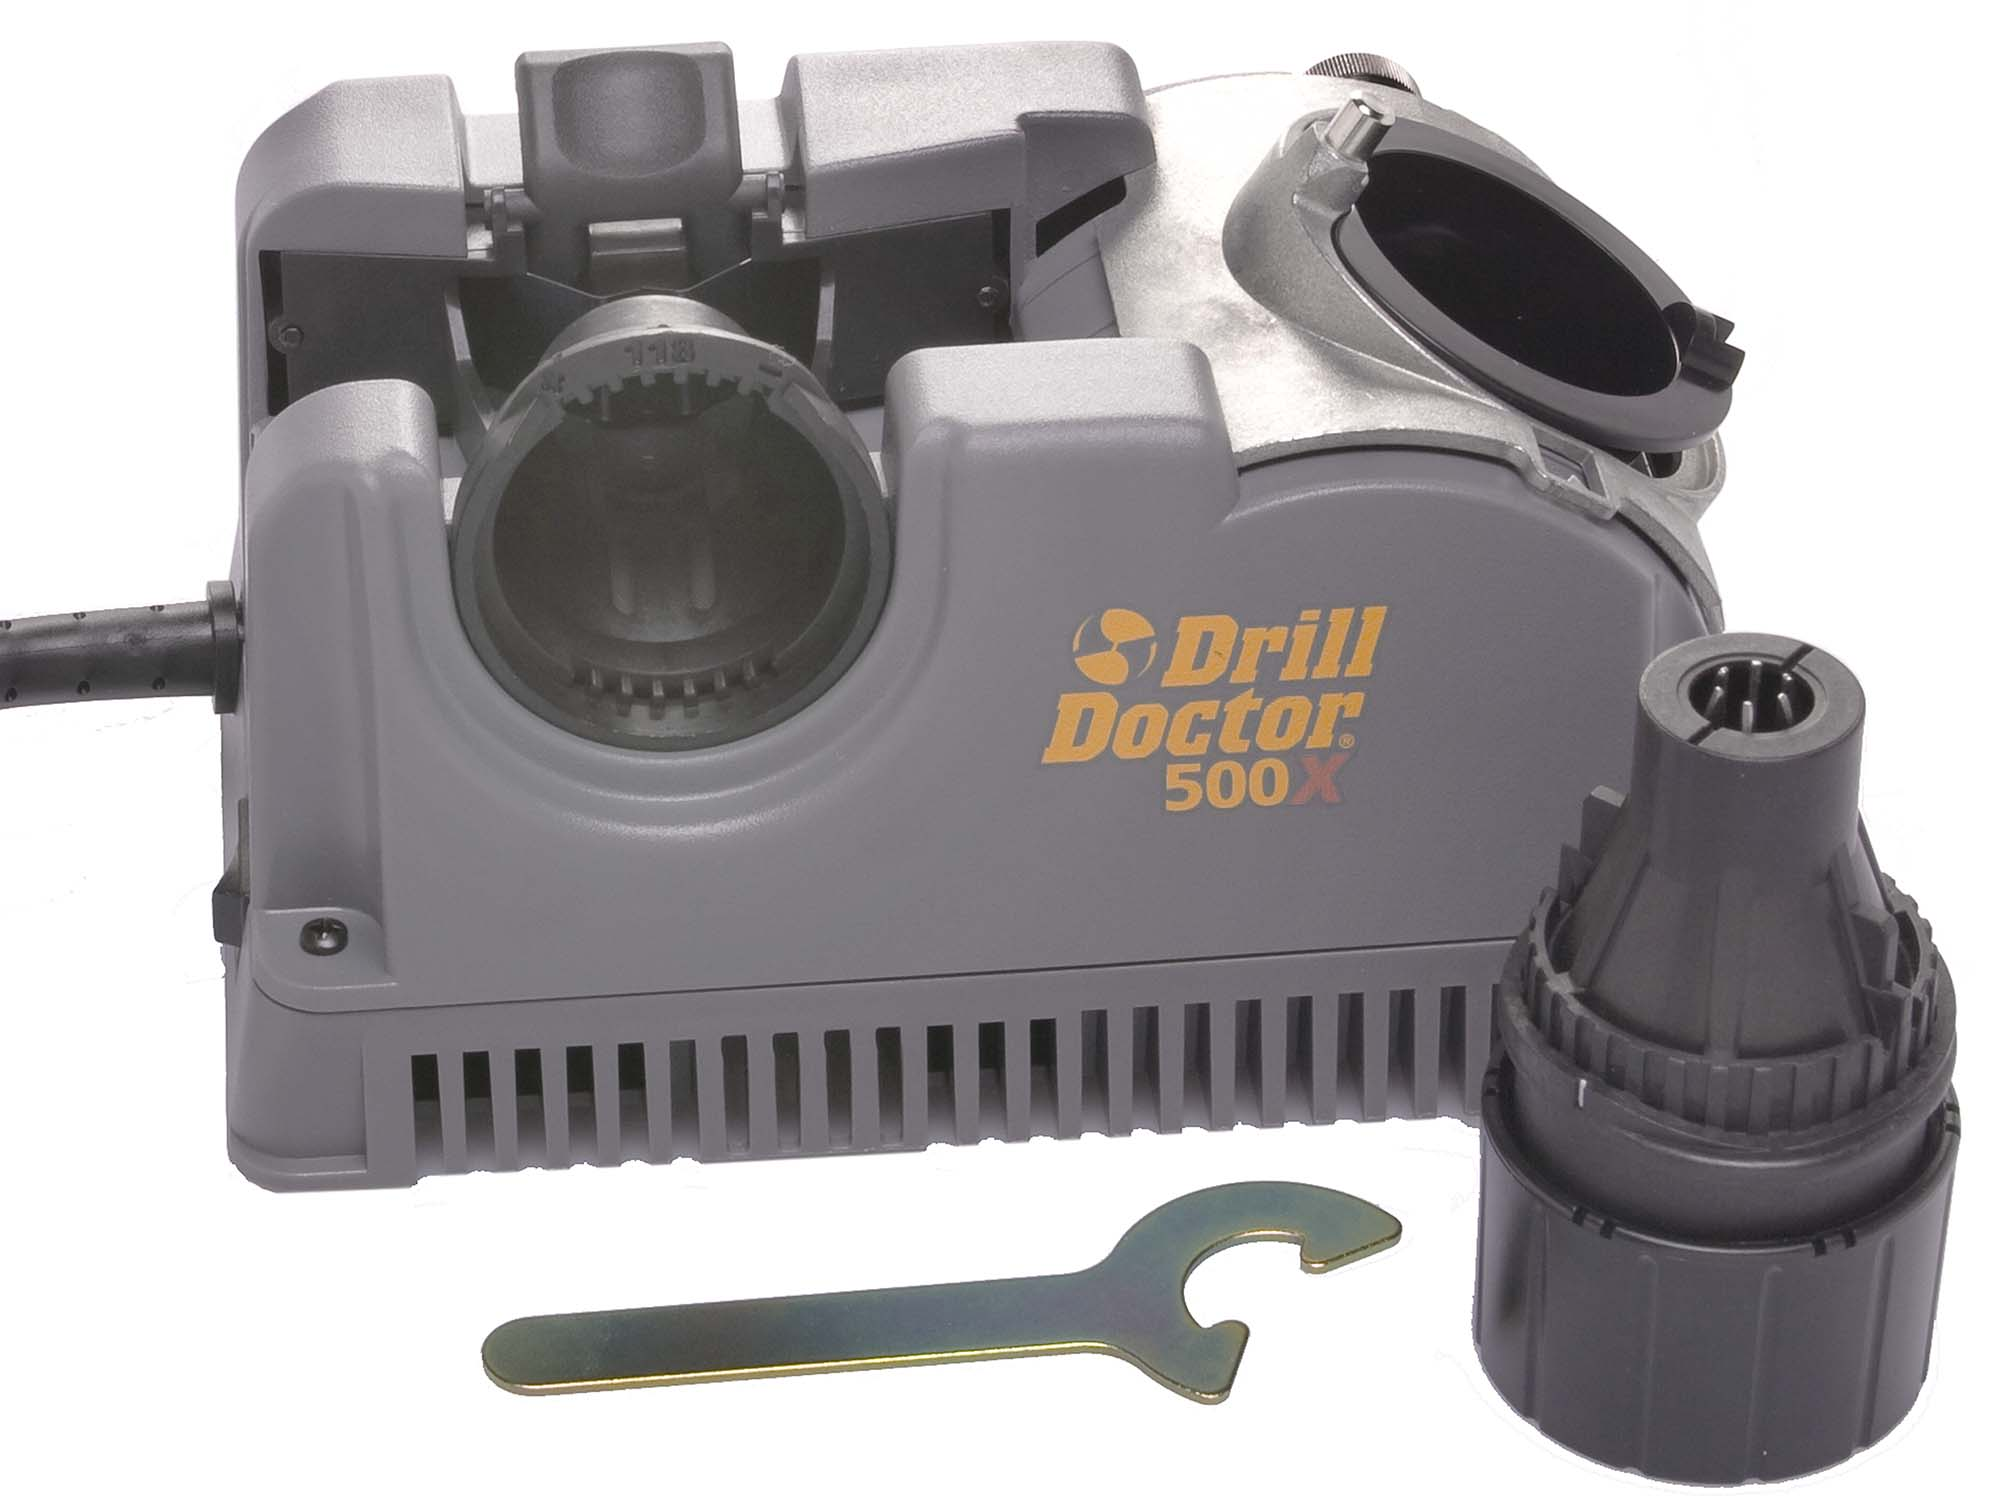 Drill Doctor 750X Bit Sharpener